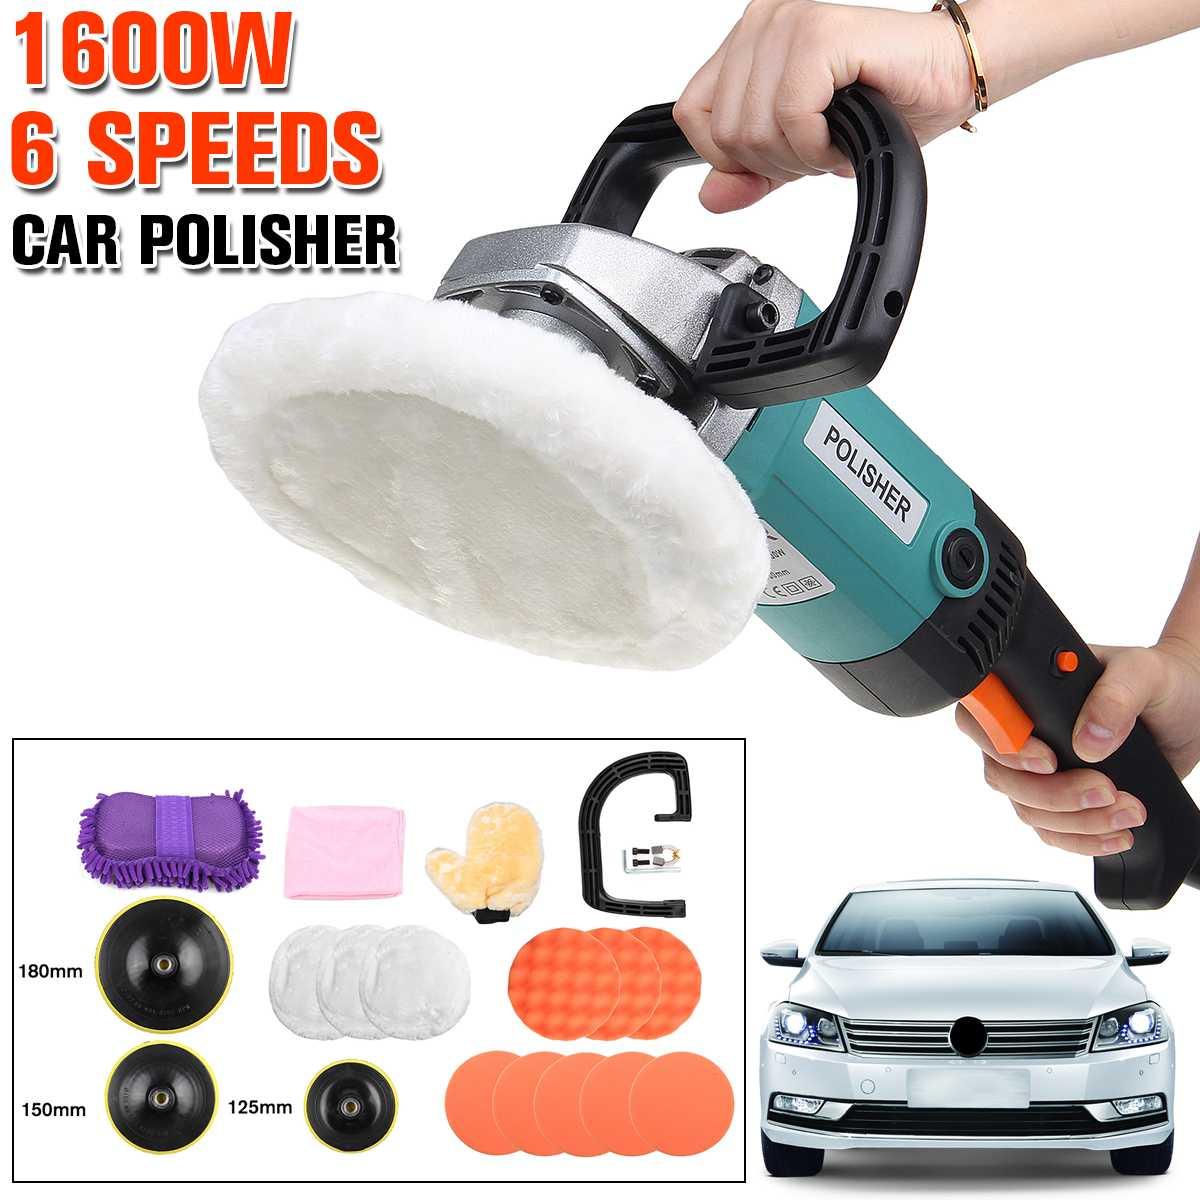 Car Wax Polisher 1600W Variable Speed 3000rpm Car Paint Care Tool Electric Polishing Machine Sander 220-240V